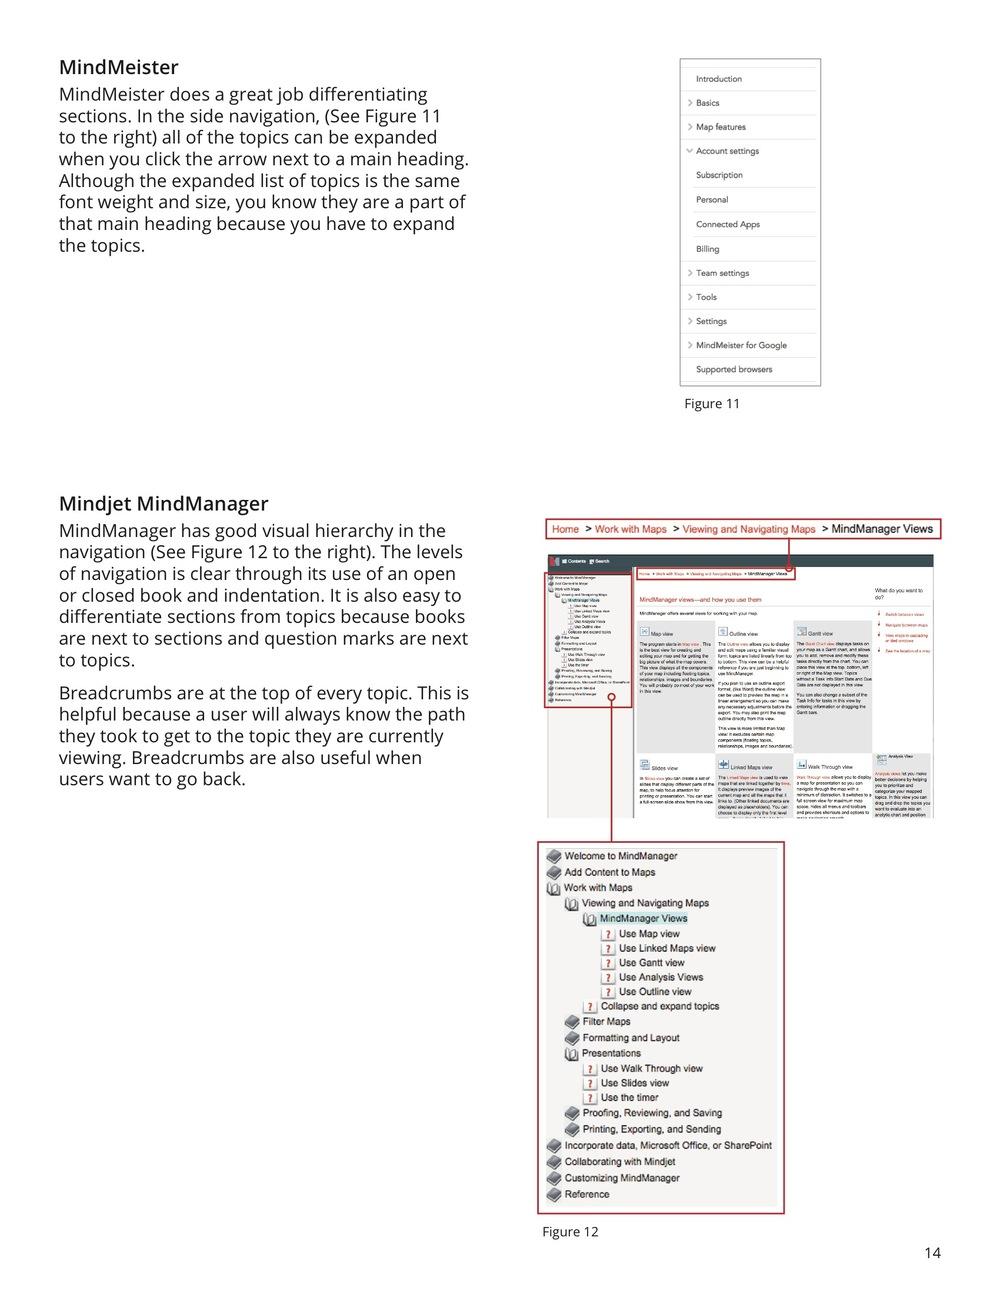 XMind Final Report_4-23-15 14-14.jpeg